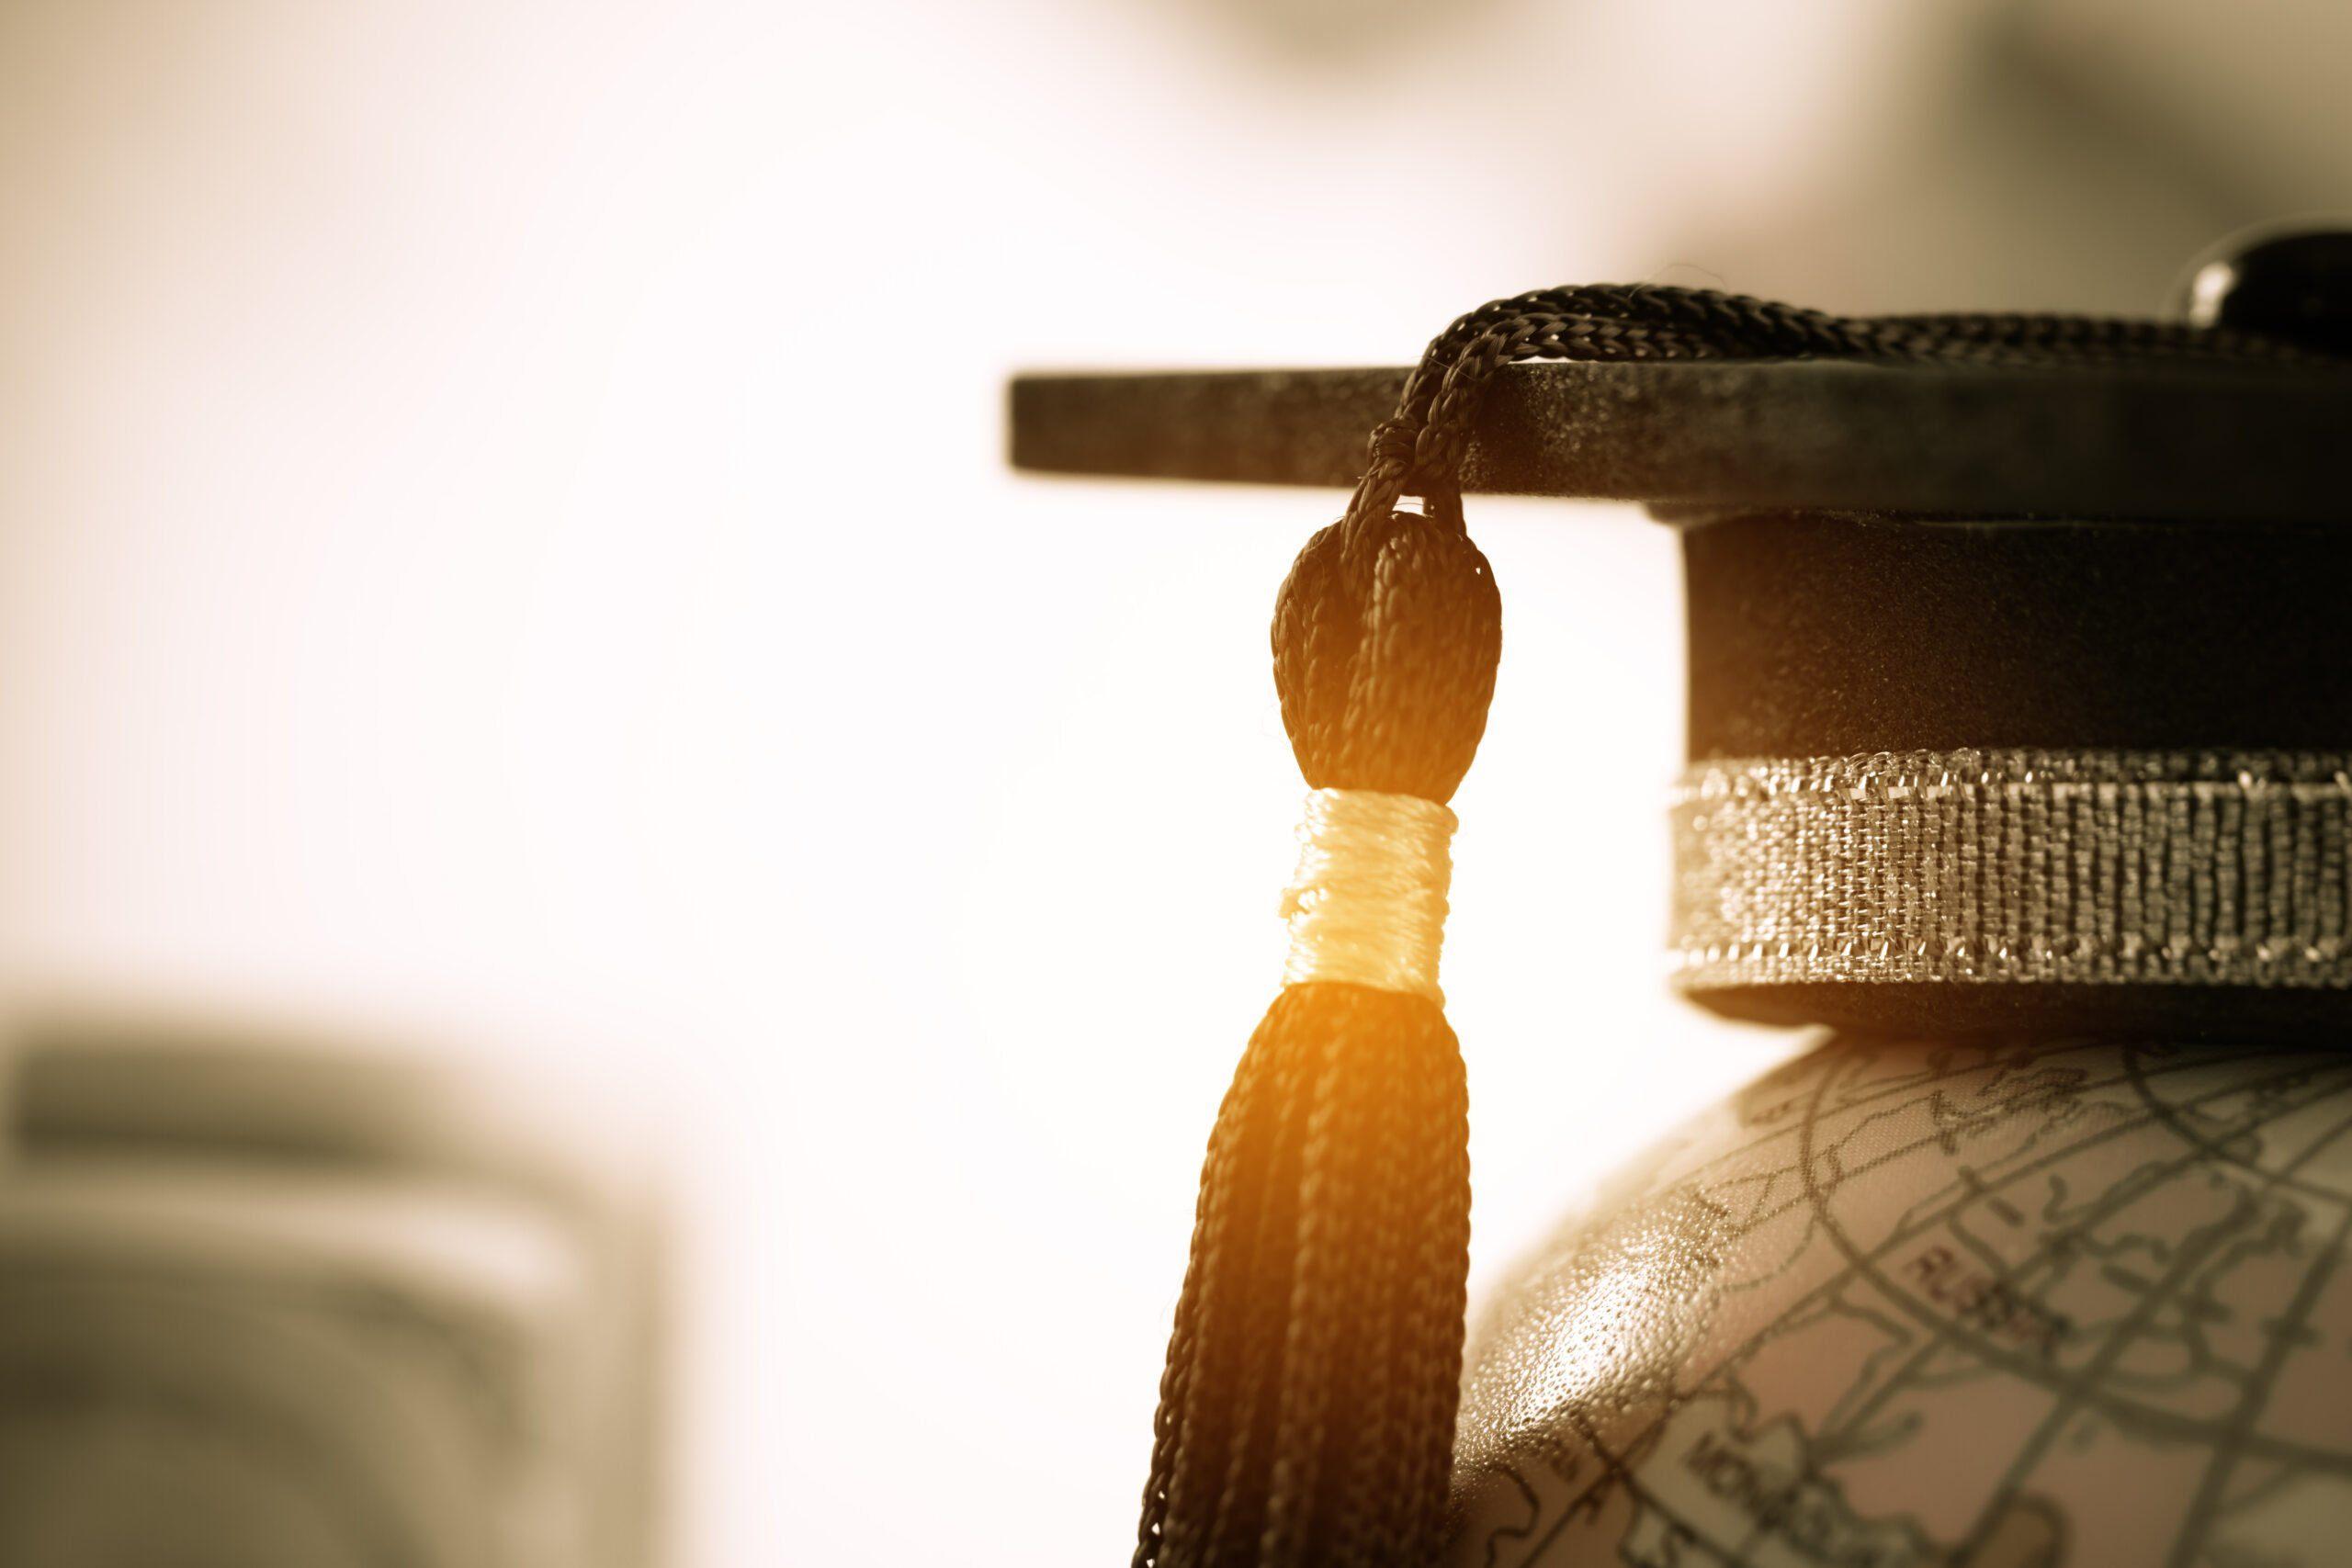 Graduated,study,abroad,international,conceptual,,graduation,hat,on,top,earth